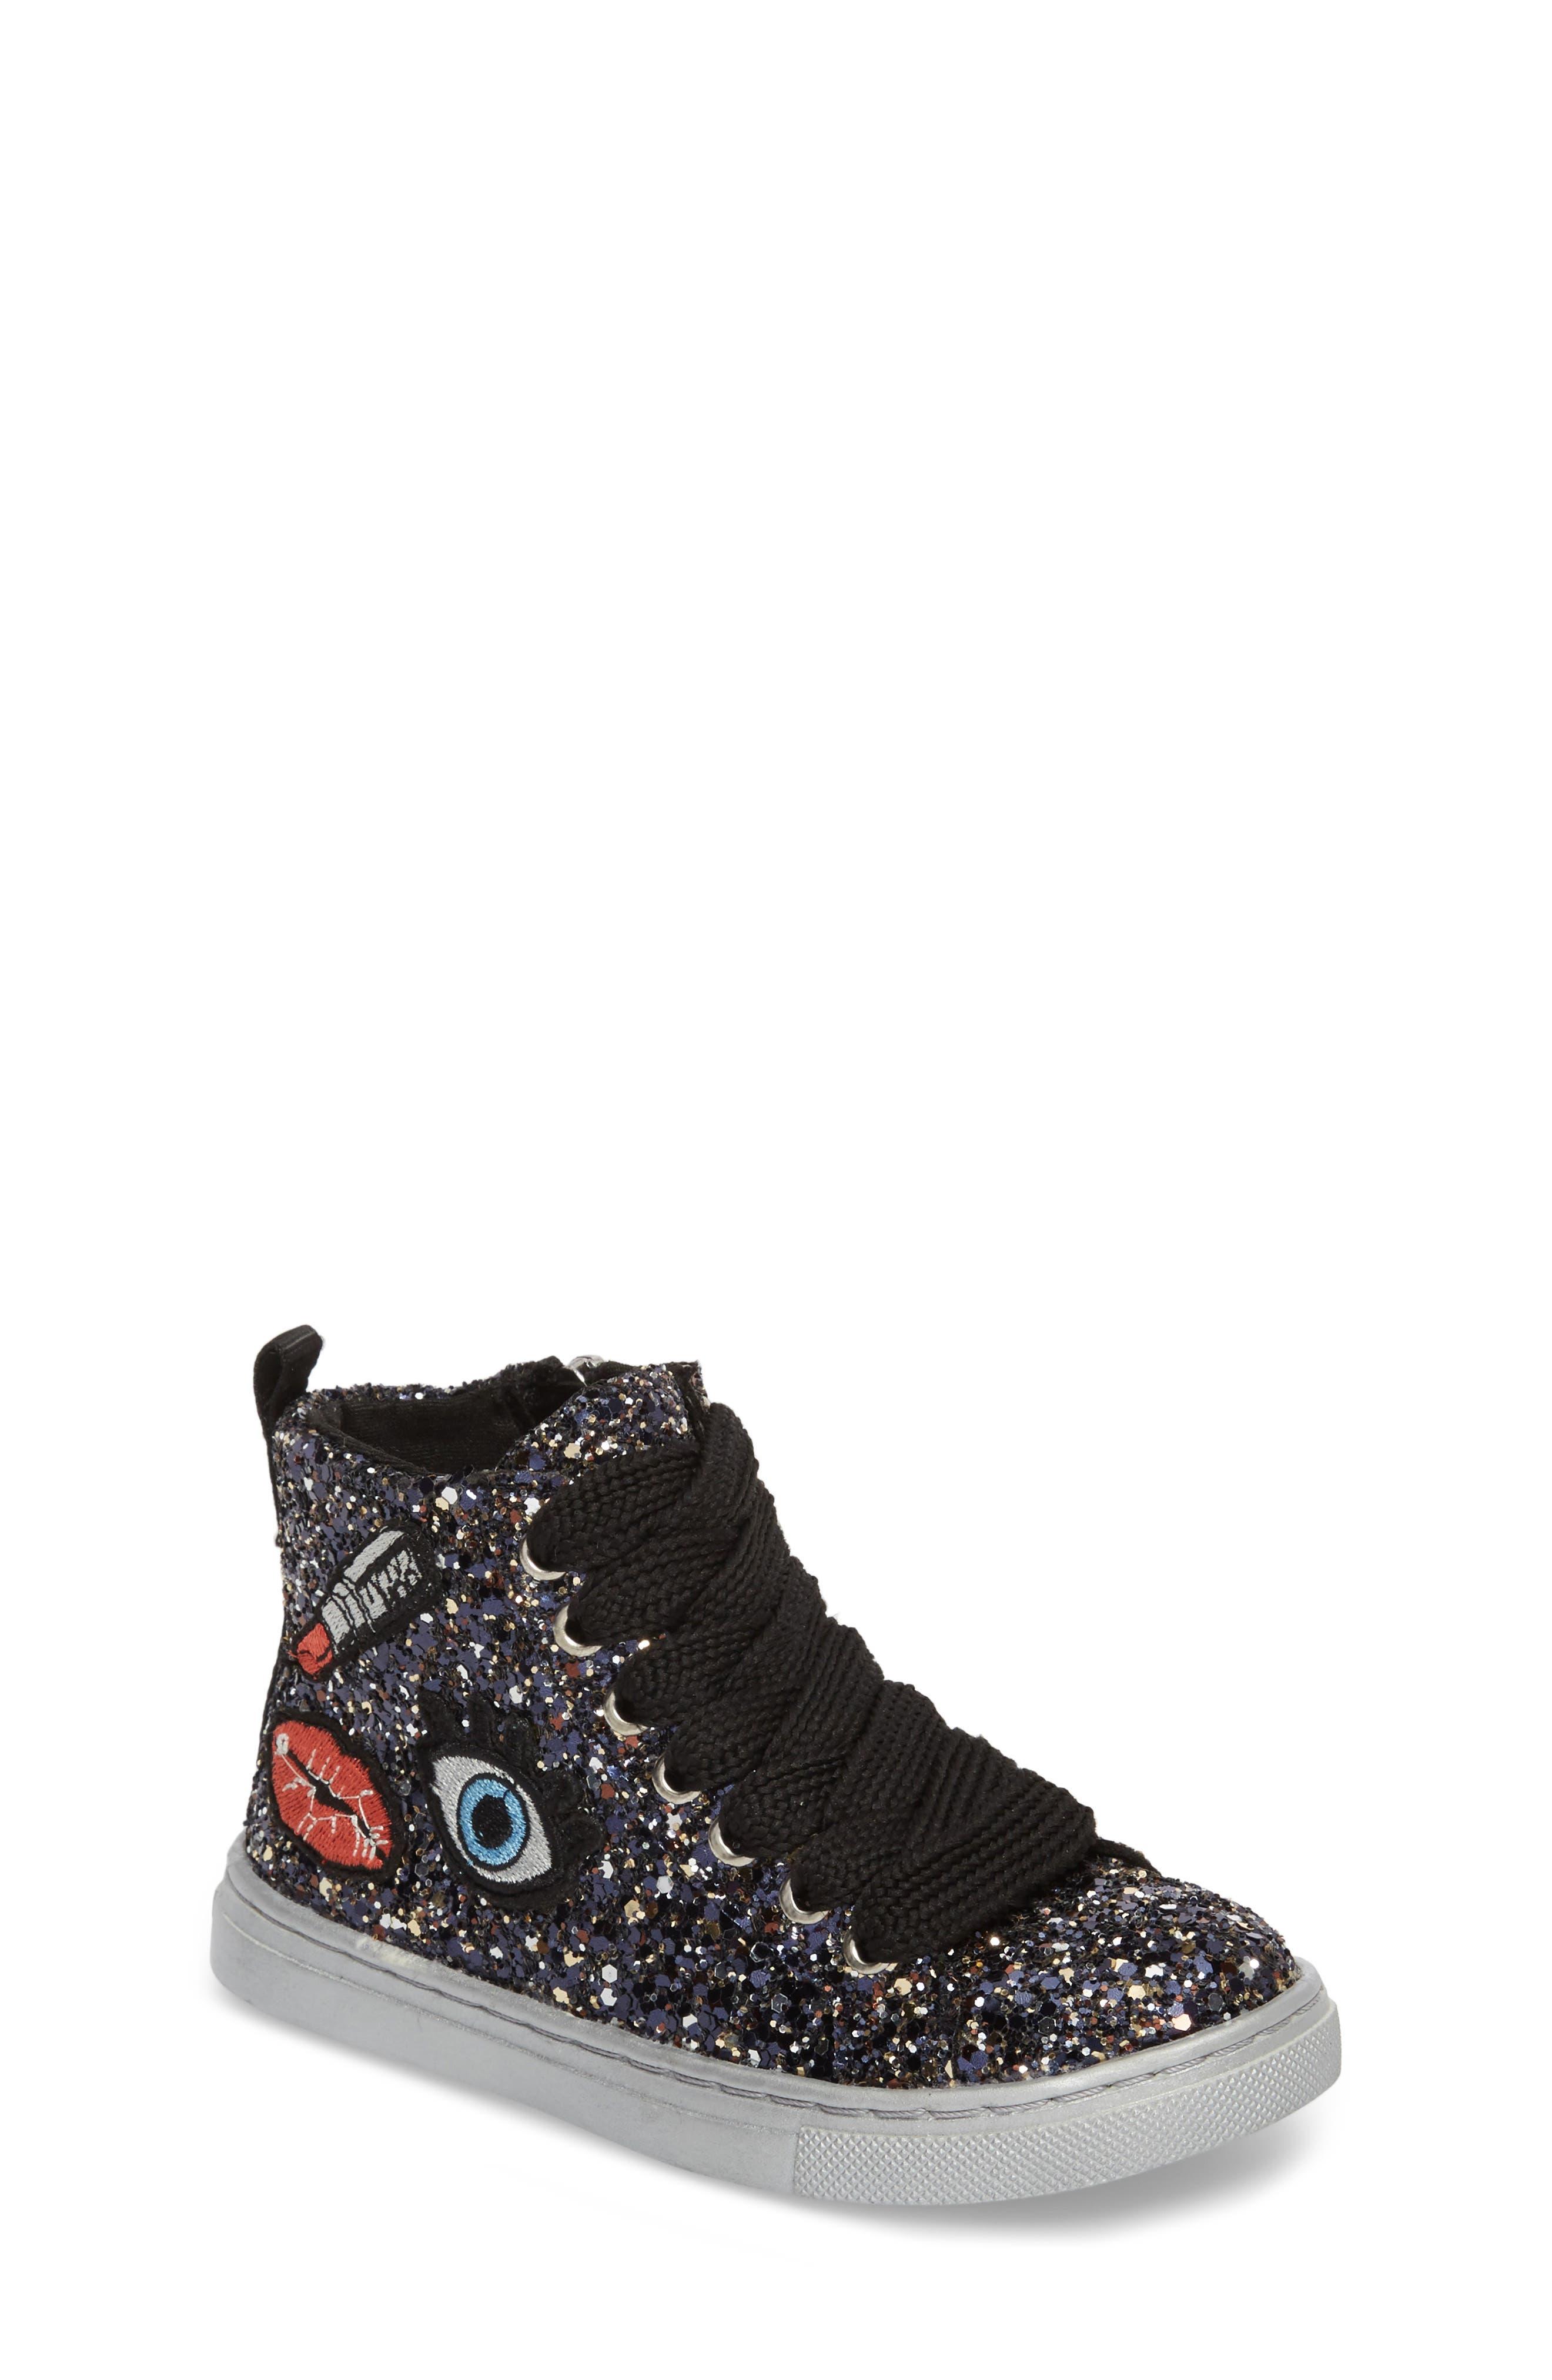 Zaine Glittery High Top Sneaker,                         Main,                         color, Black Multi Glitter